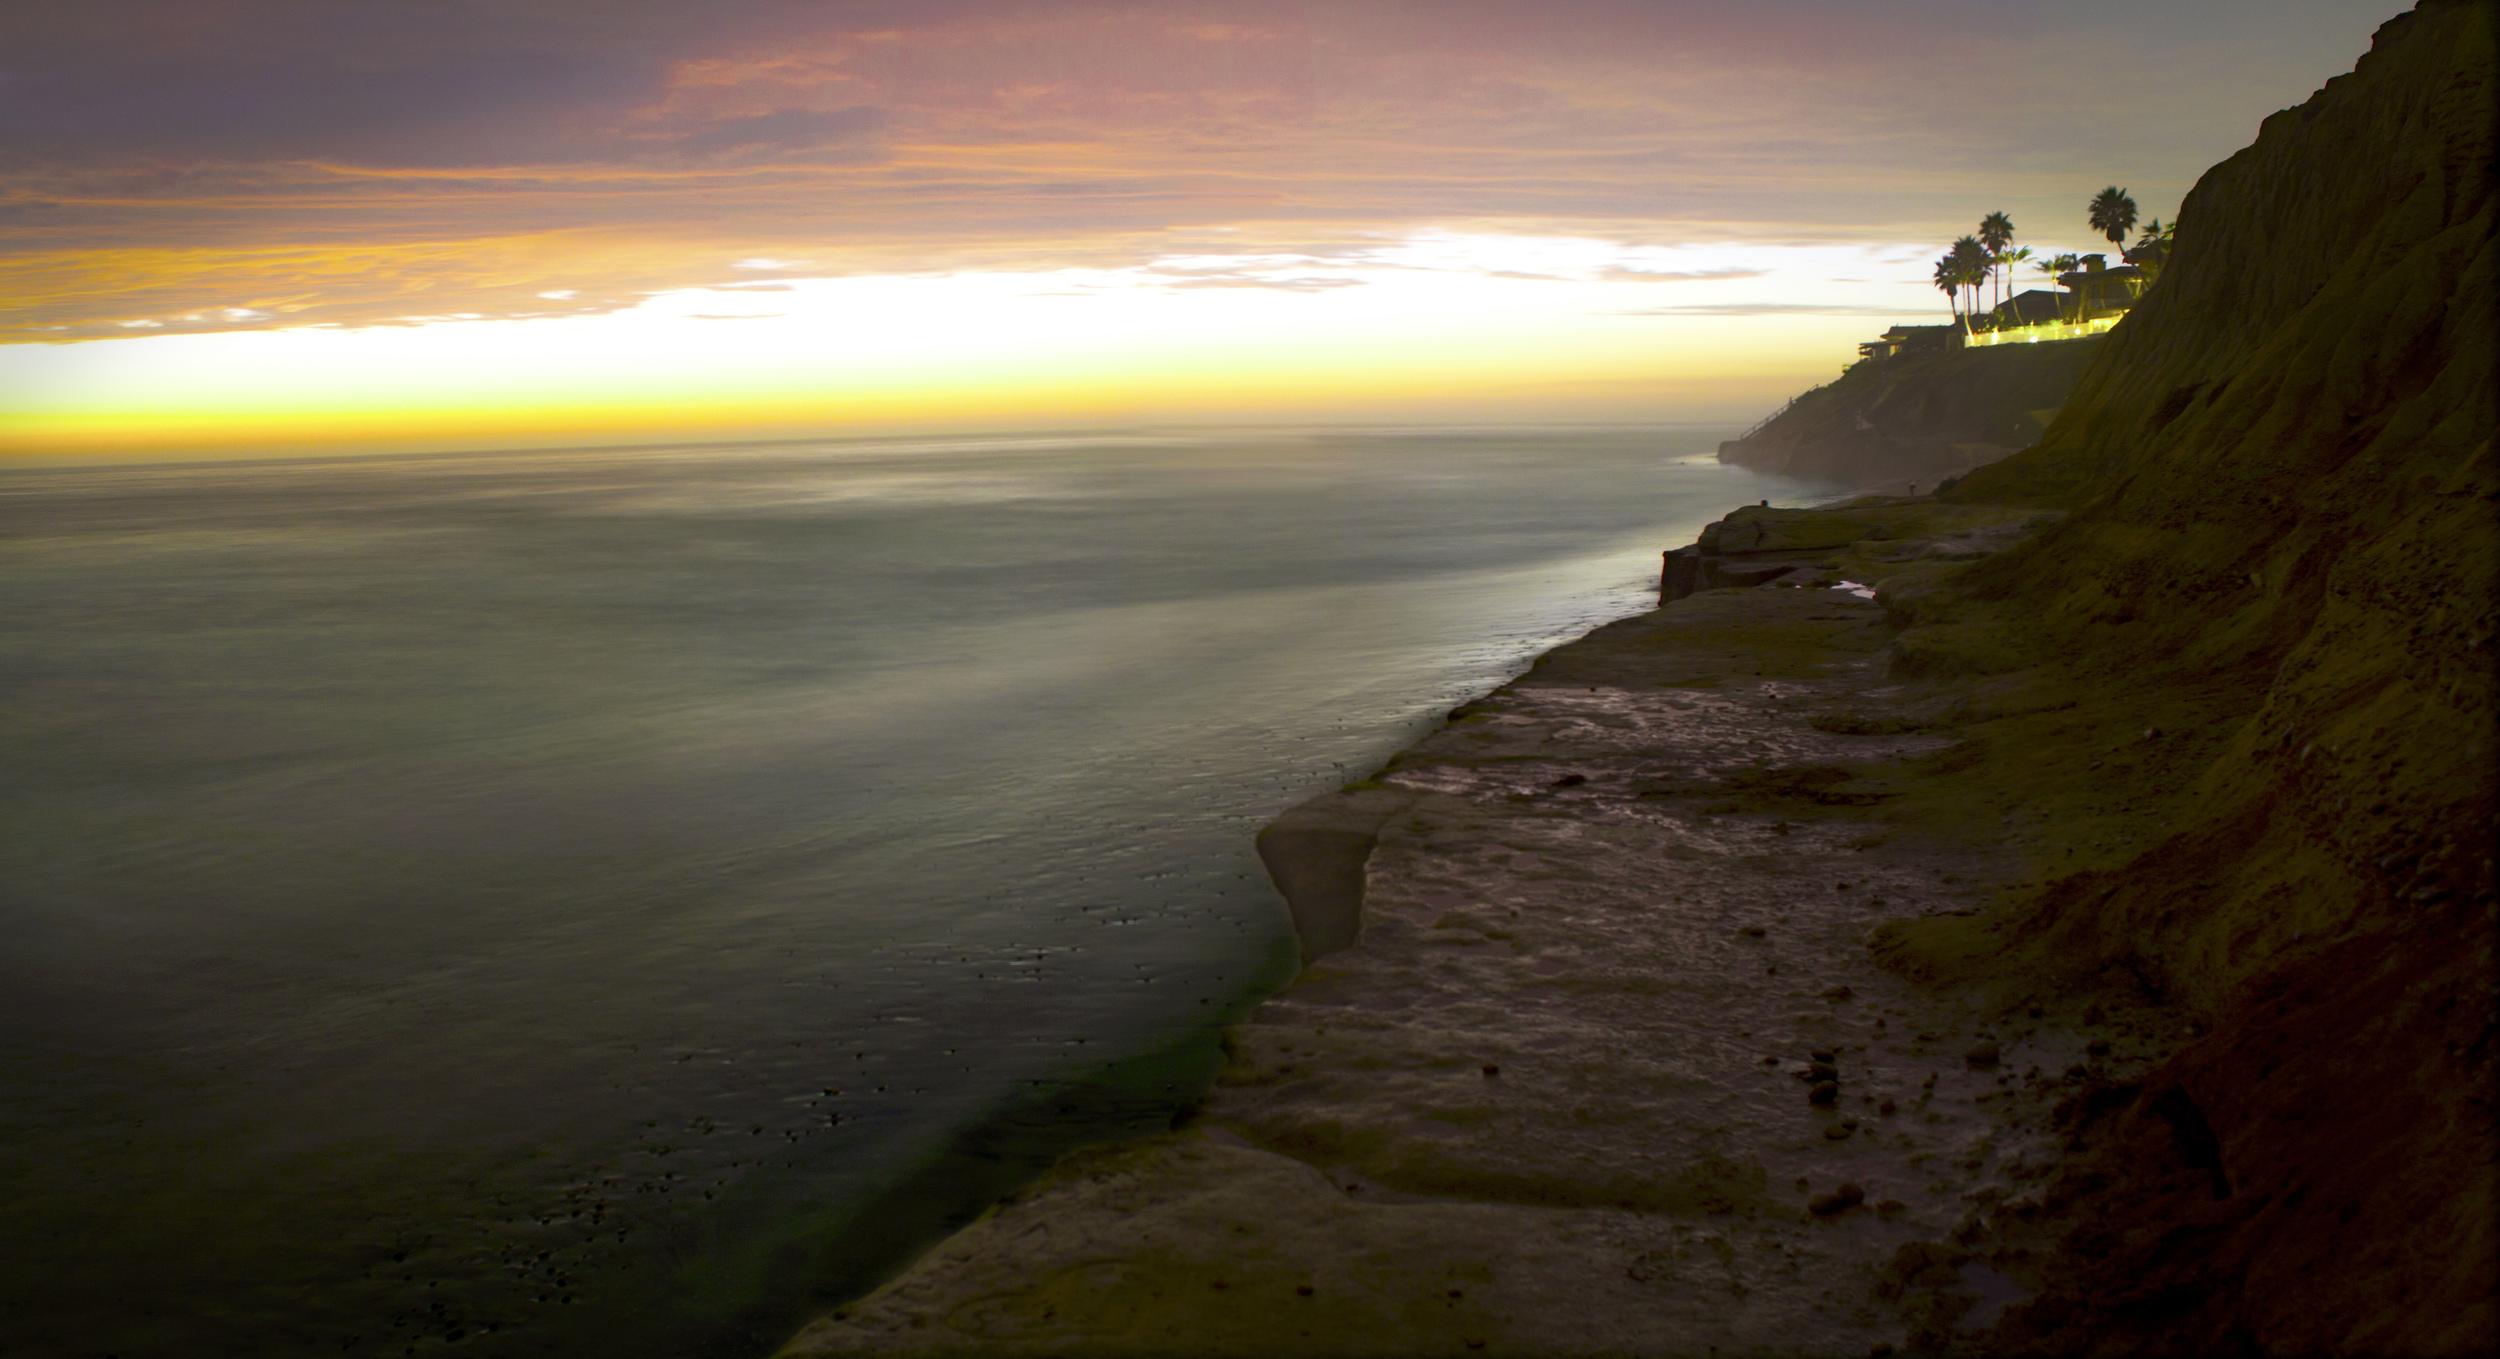 Egor Cliff ThunderStorm Sunset 2 Photo Stich CC 2.jpg